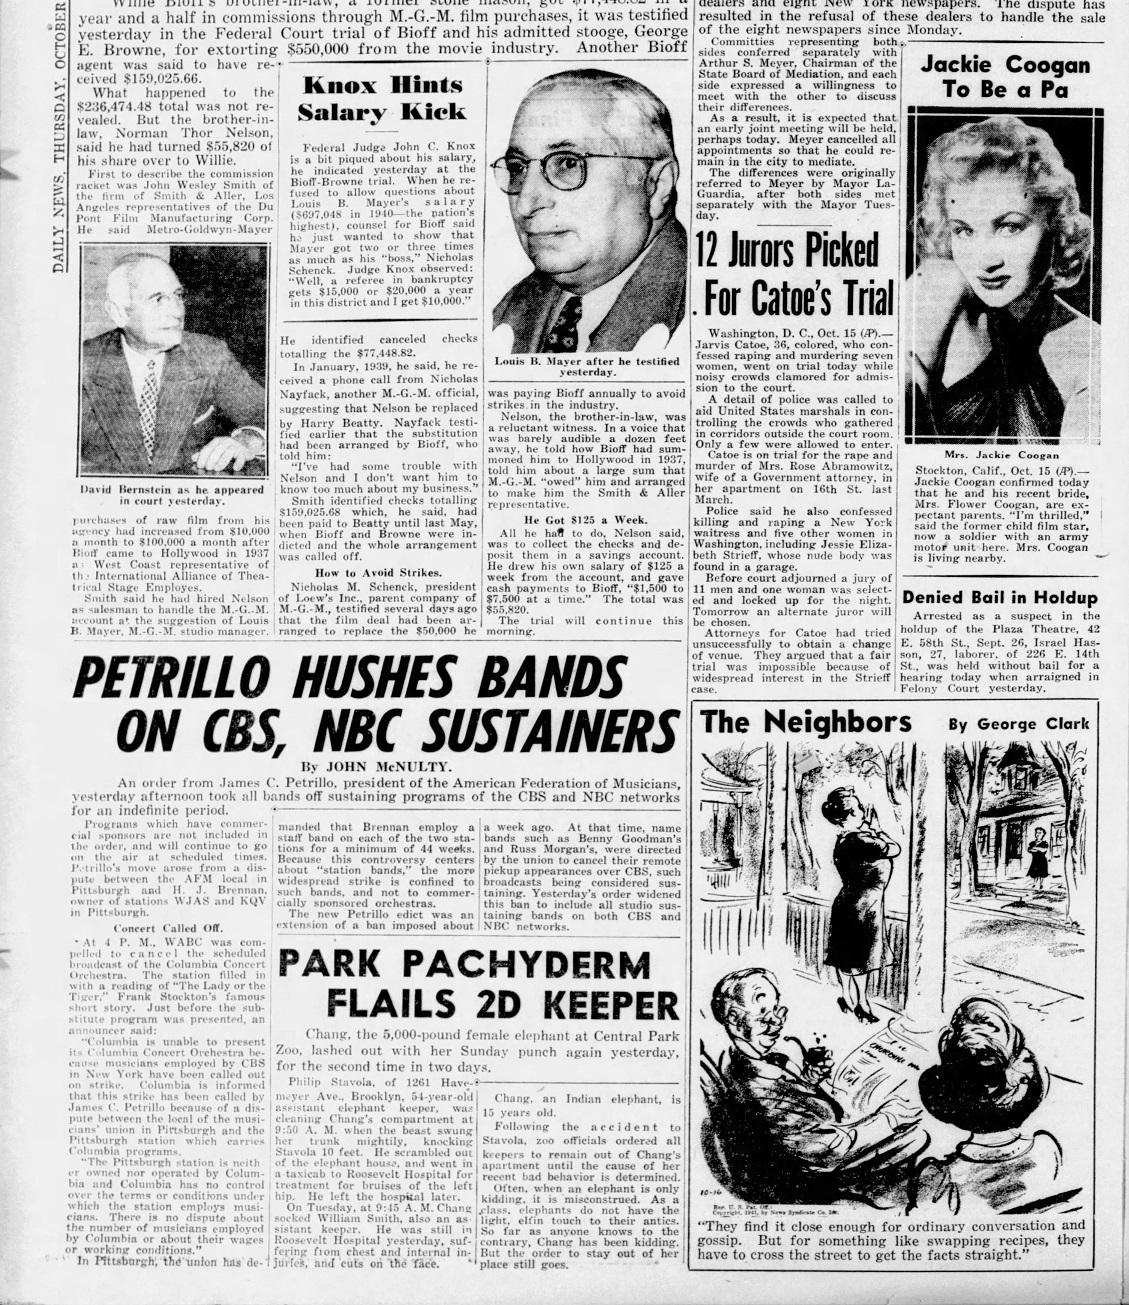 Daily_News_Thu__Oct_16__1941_.jpg